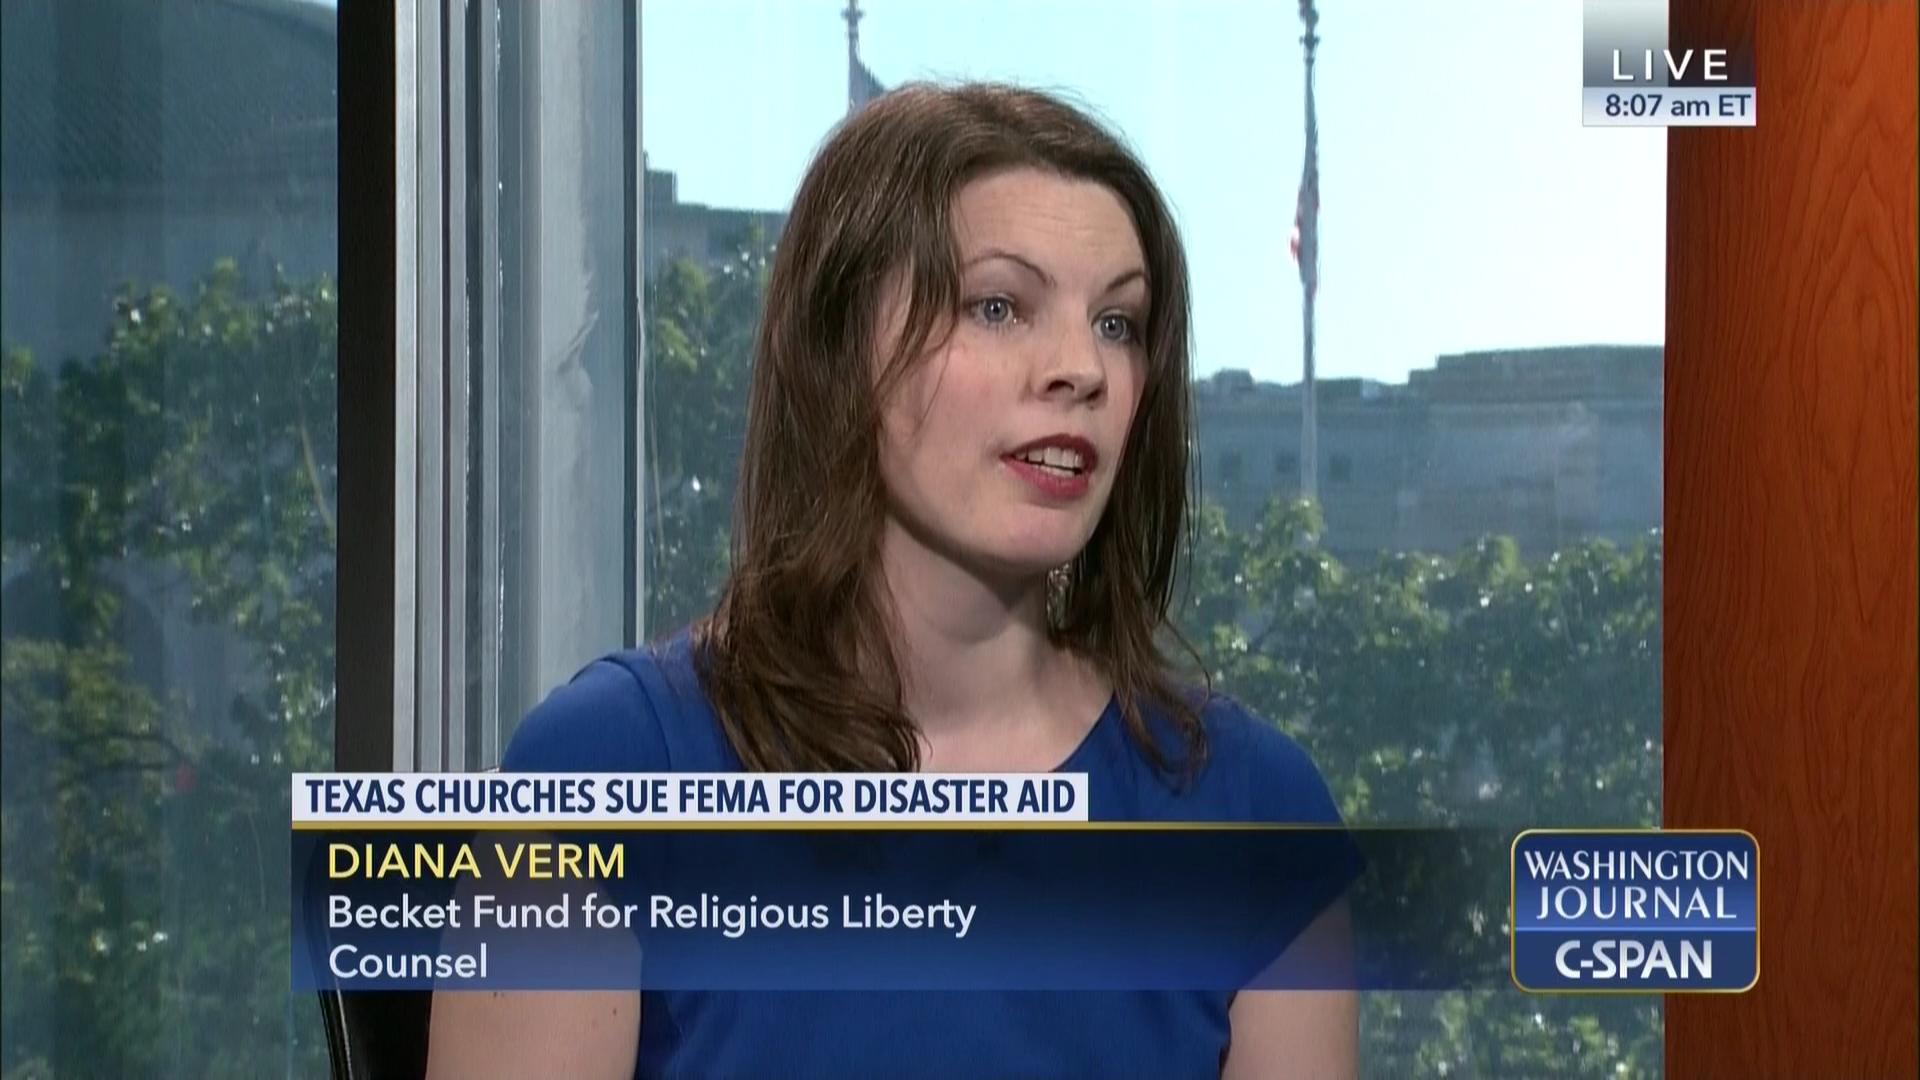 New diana high school tx fax - Washington Journal Diana Verm Disaster Relief Aid Religious C Span Org